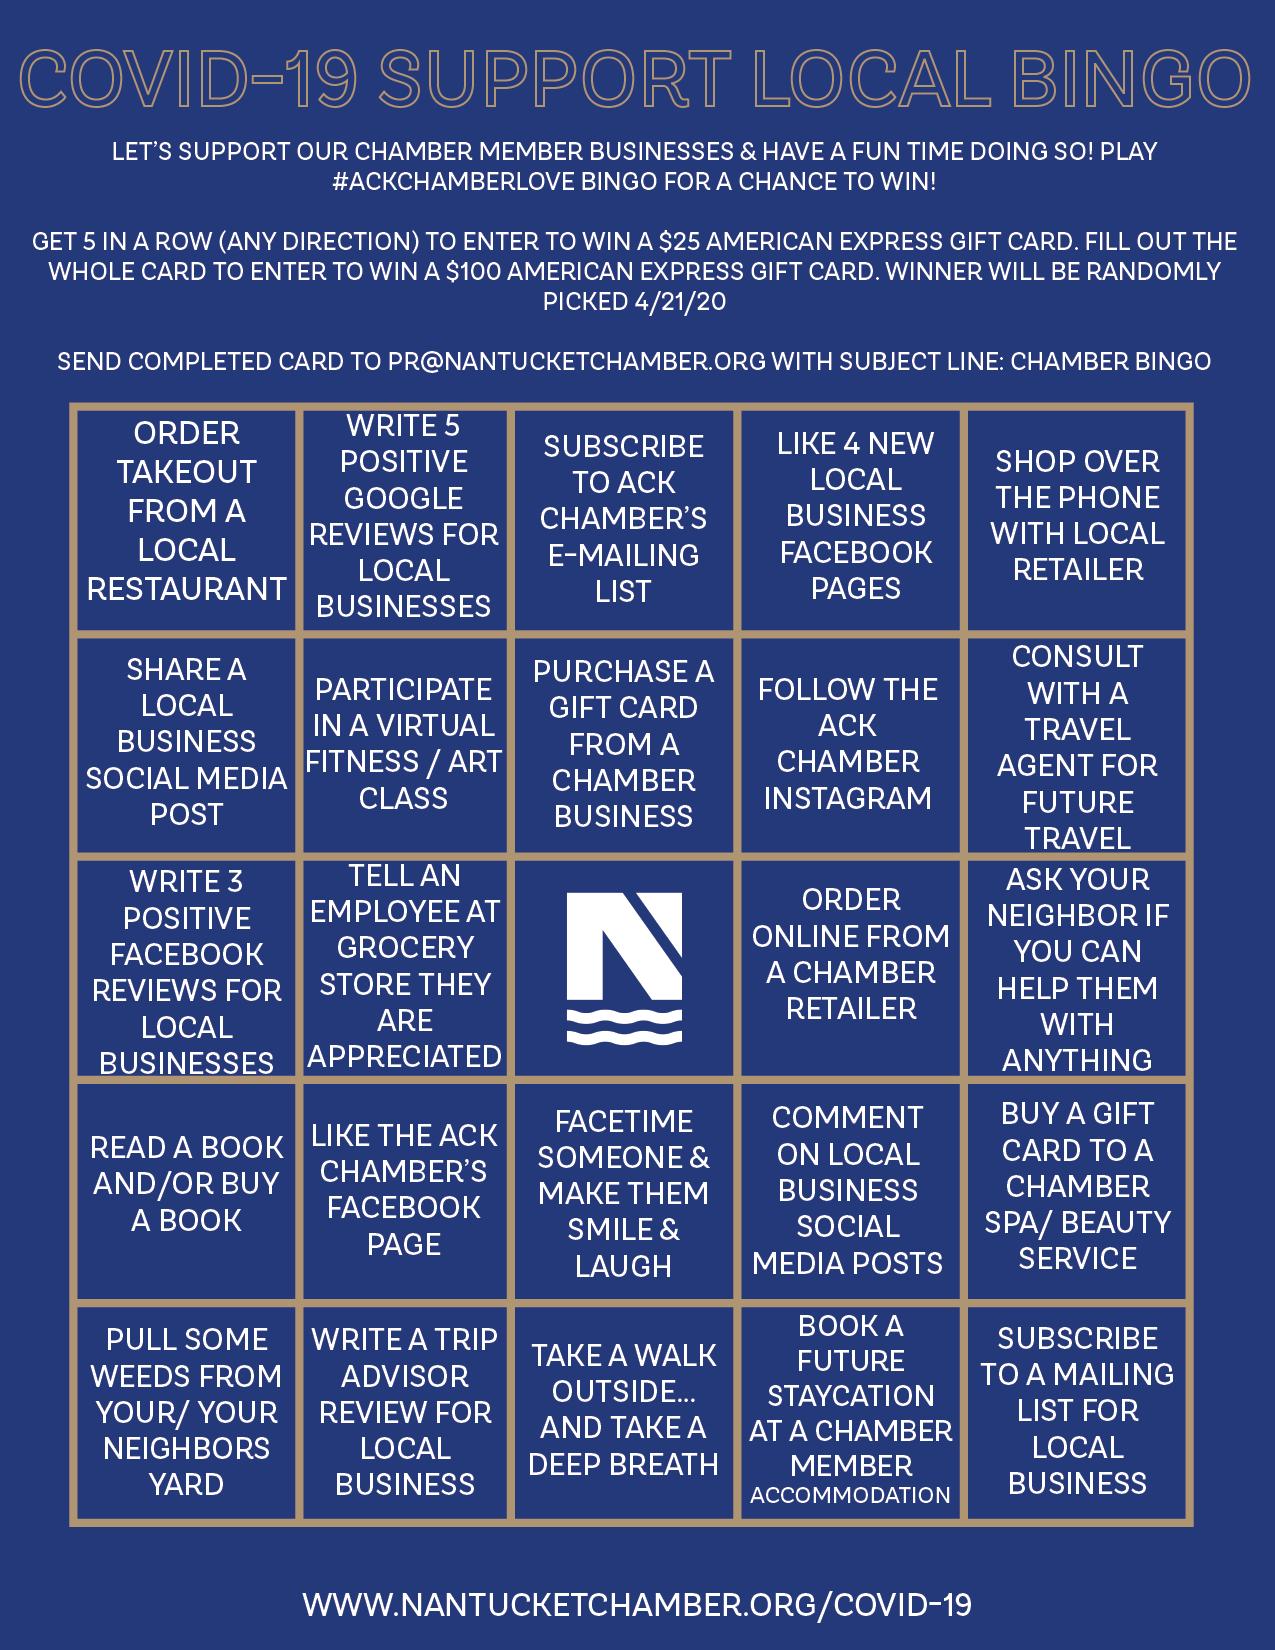 COVID19 Bingo Flyer ENTER TO WIN Nantucket